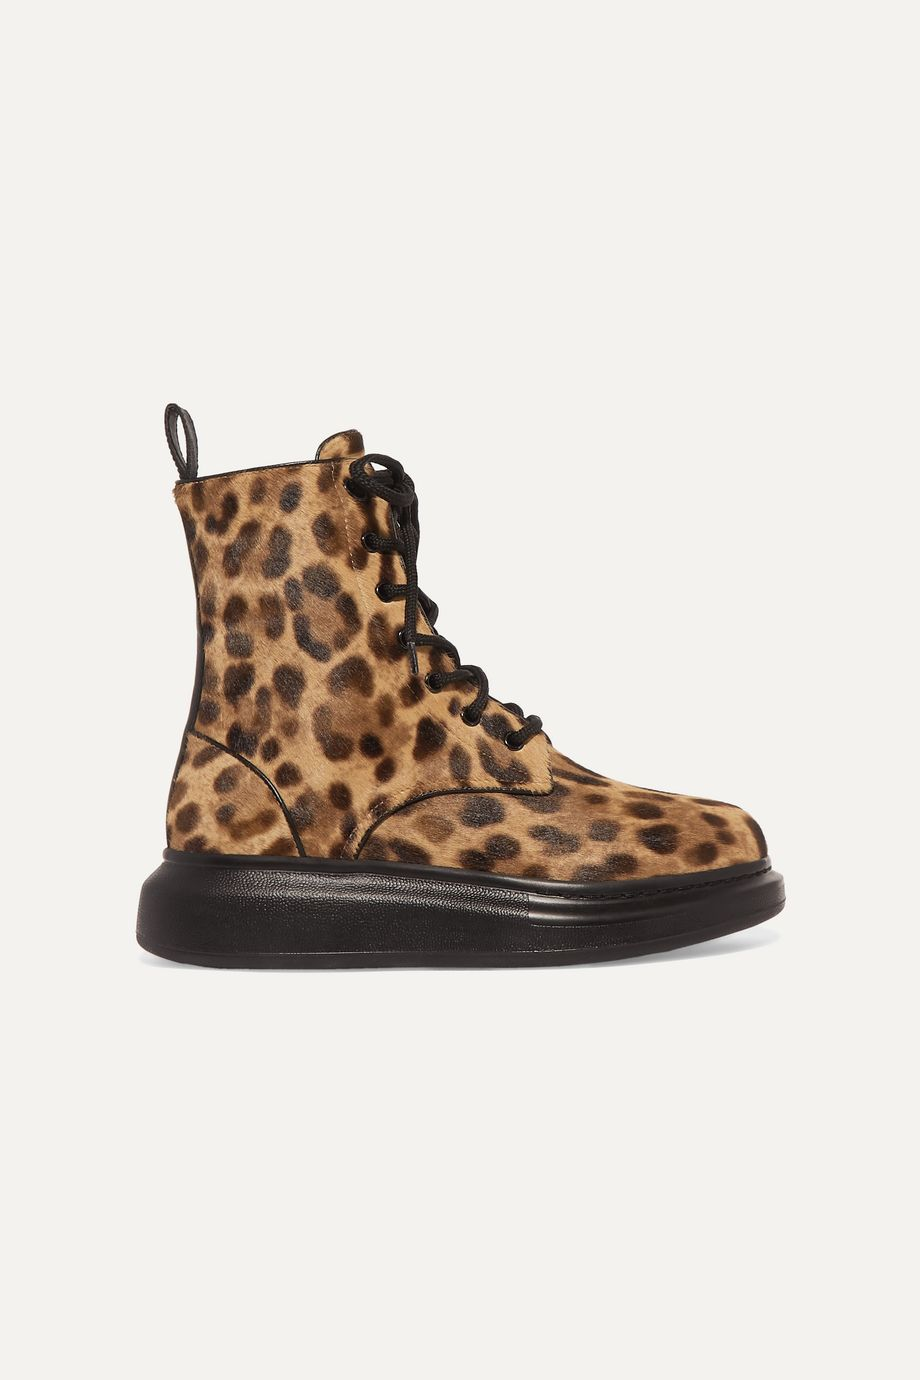 Alexander McQueen Leopard-print calf hair ankle boots